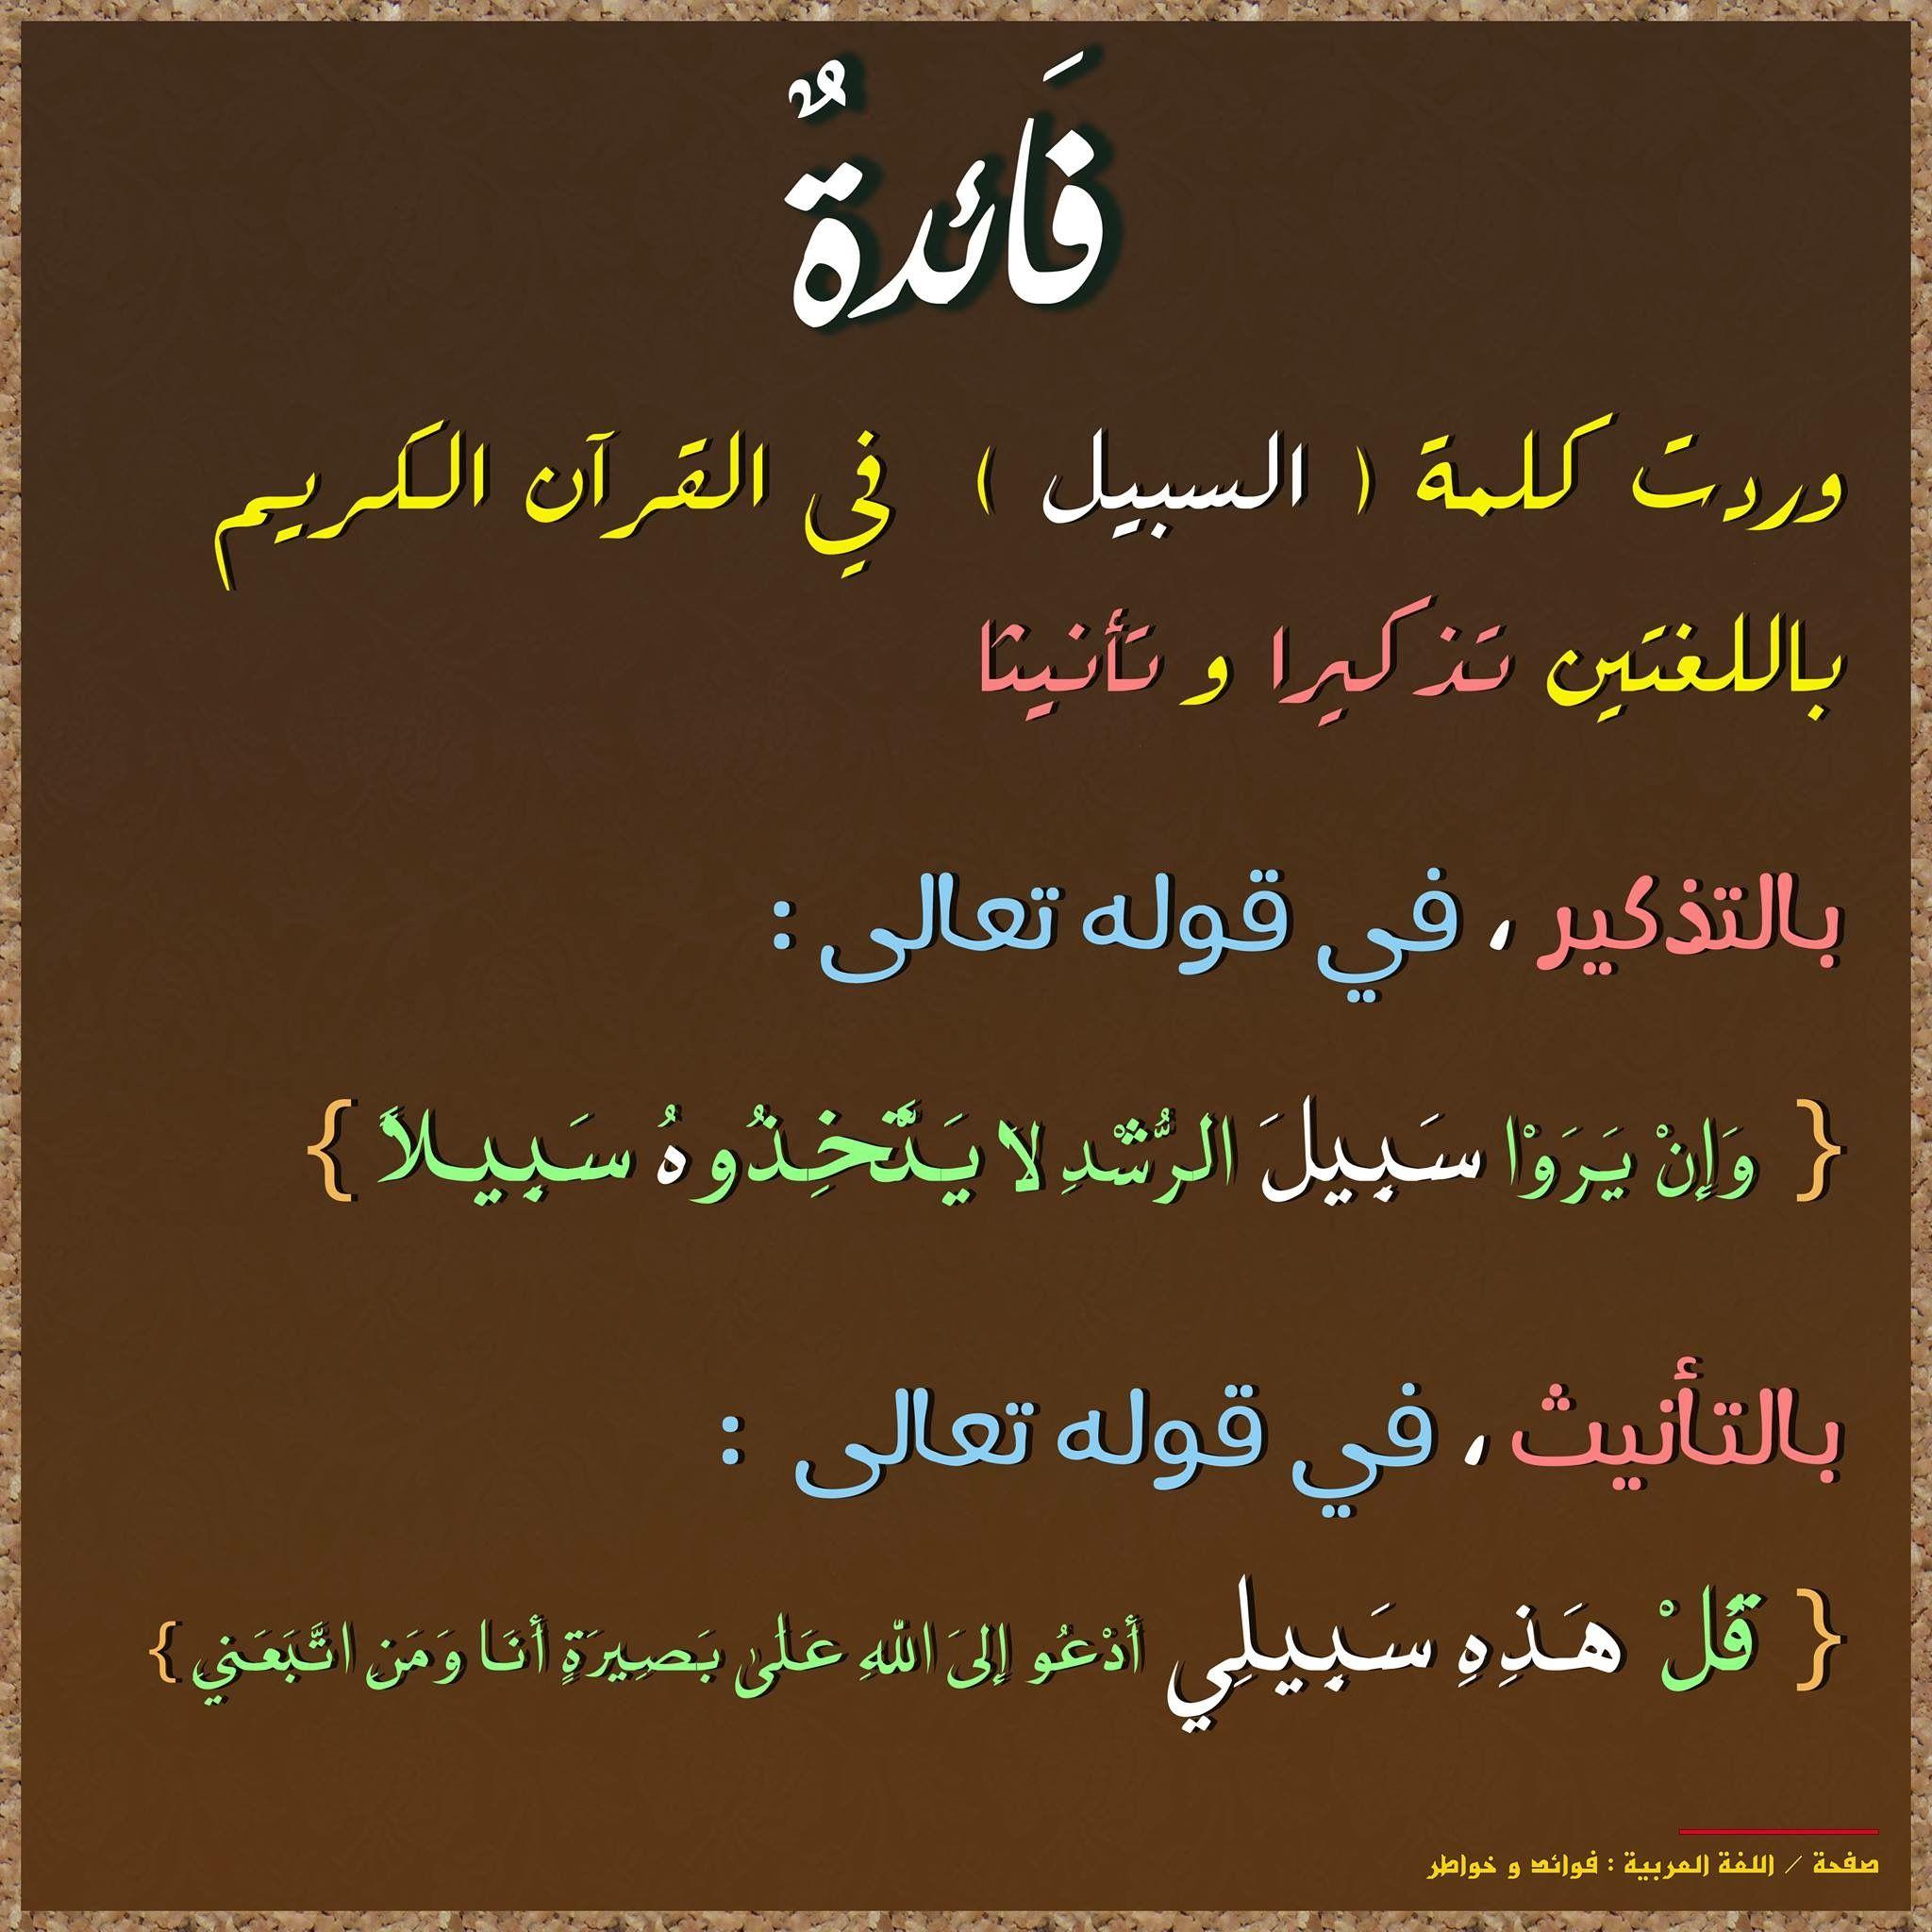 سبيل مذكر مؤنث Arabic Language Arabic Arabic Calligraphy